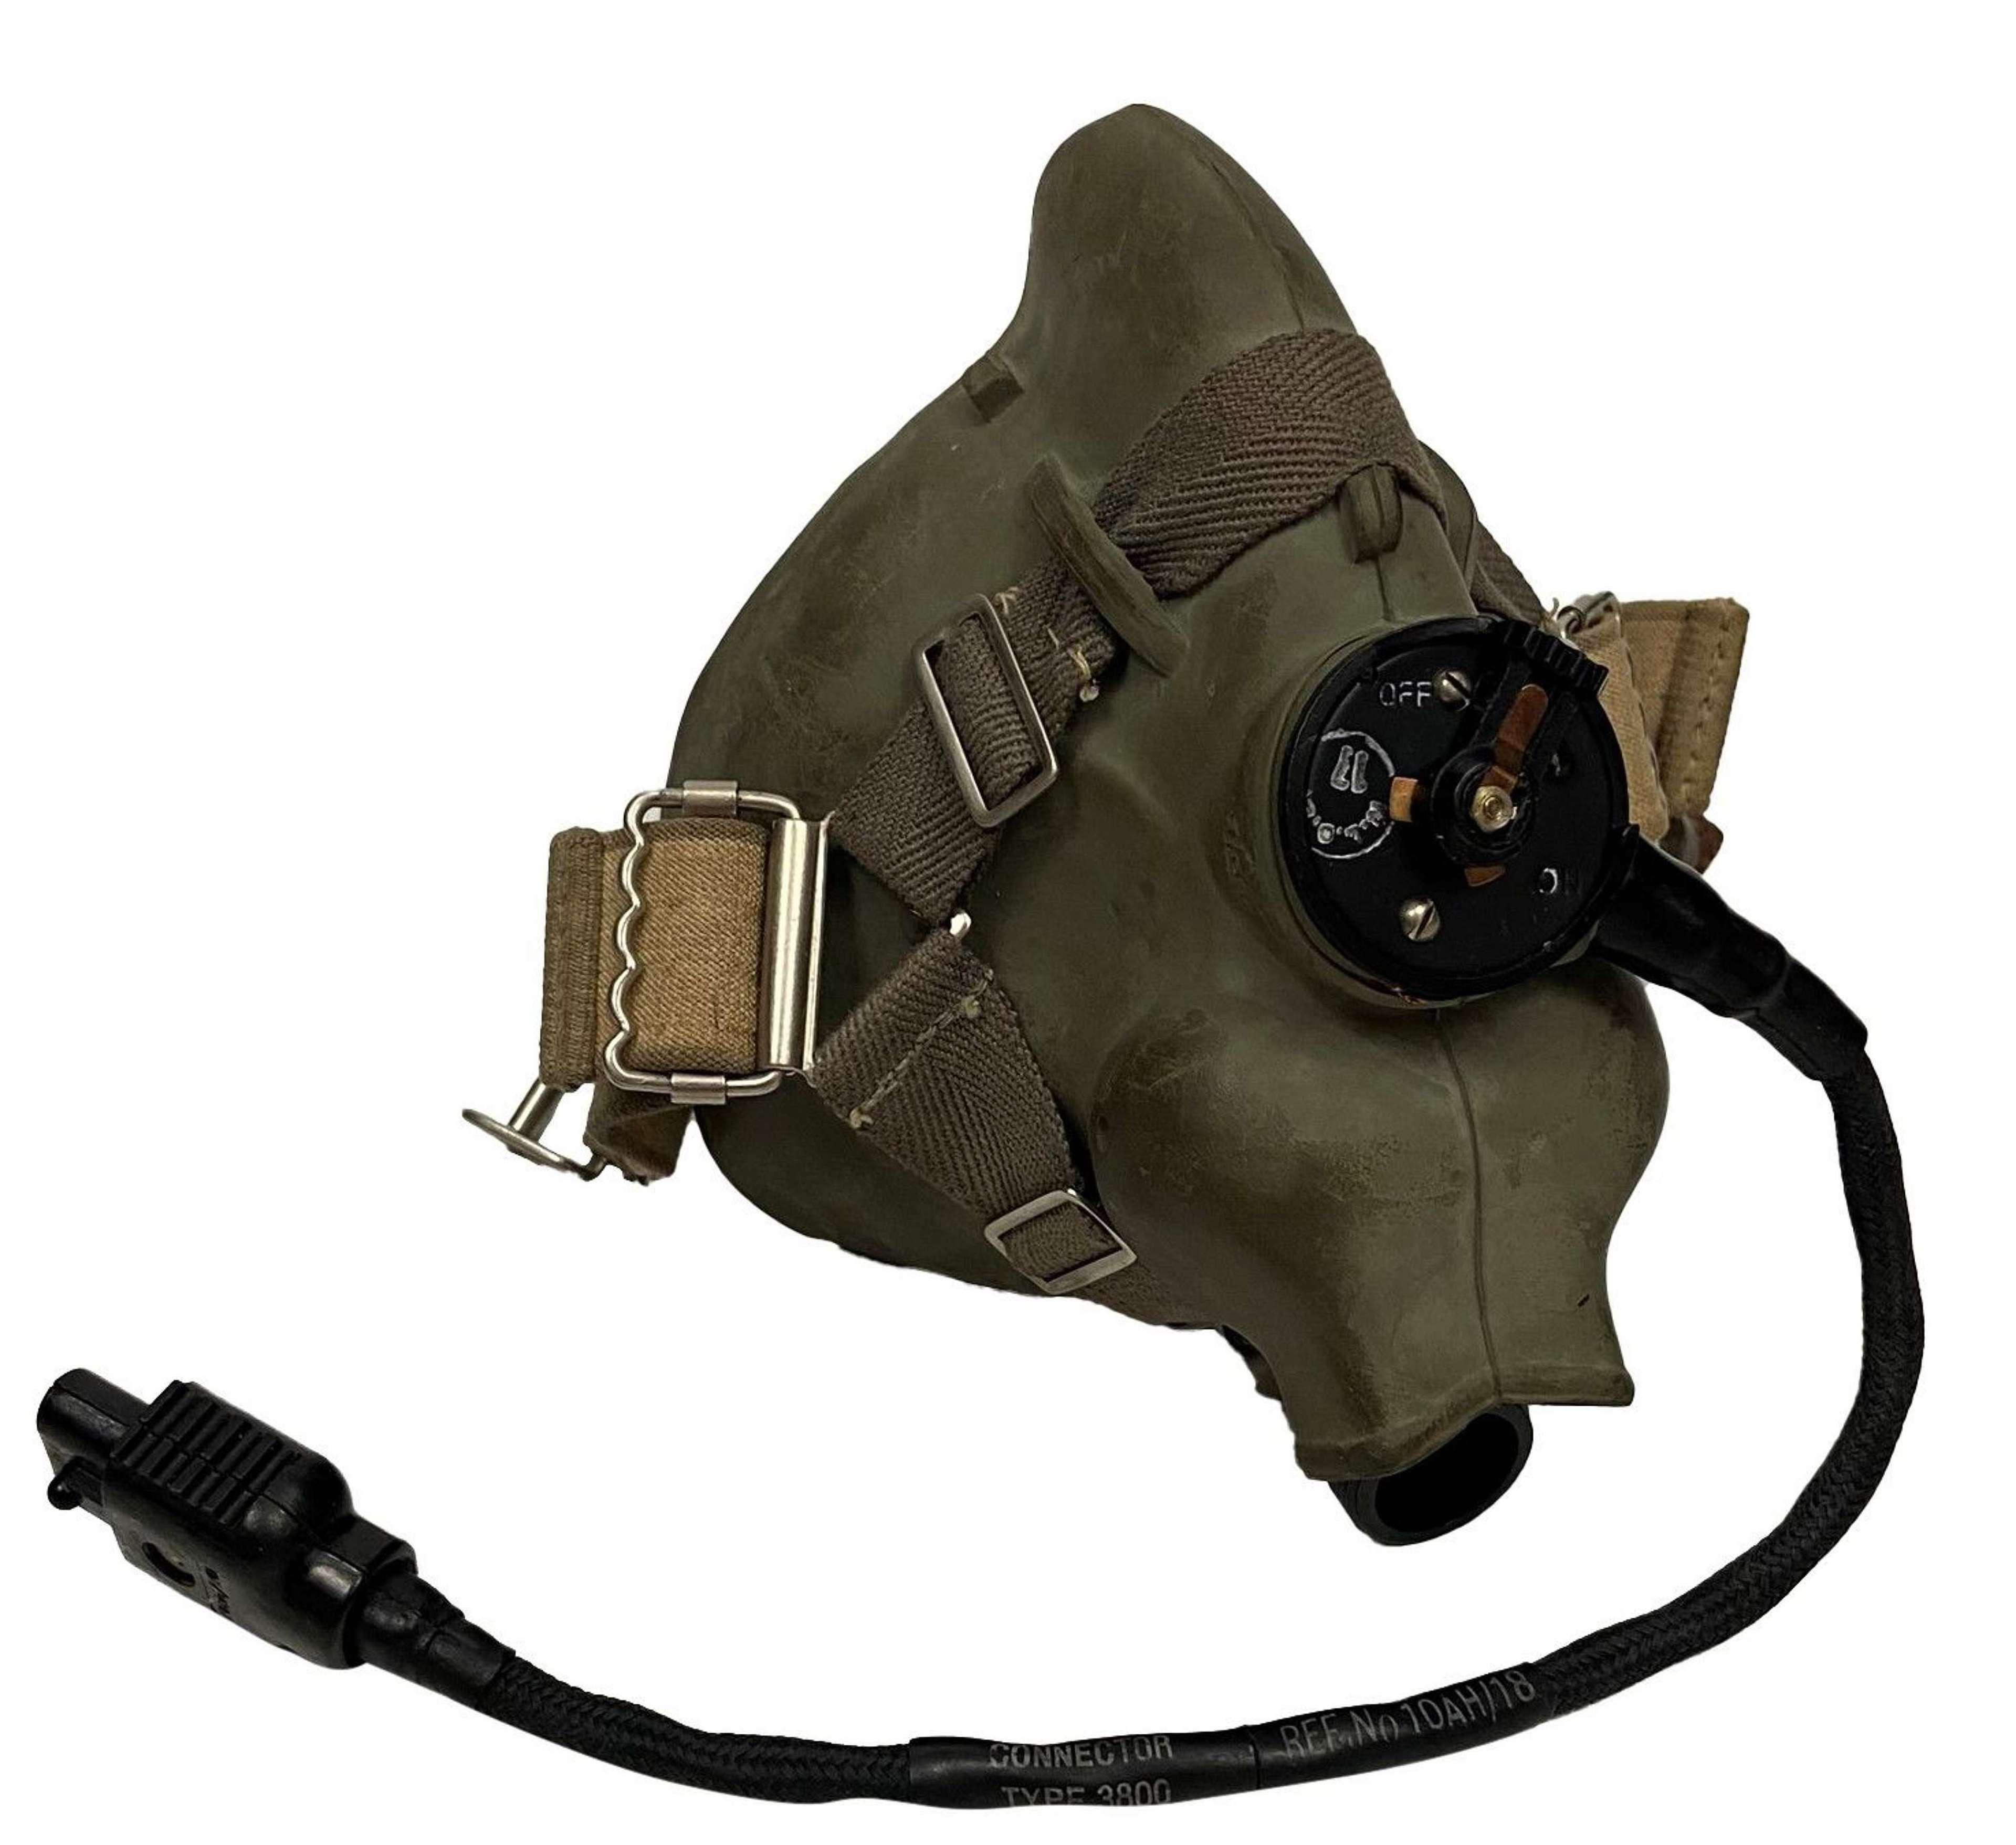 Original 1964 Dated RAF H Type Oxygen Mask - Size Large